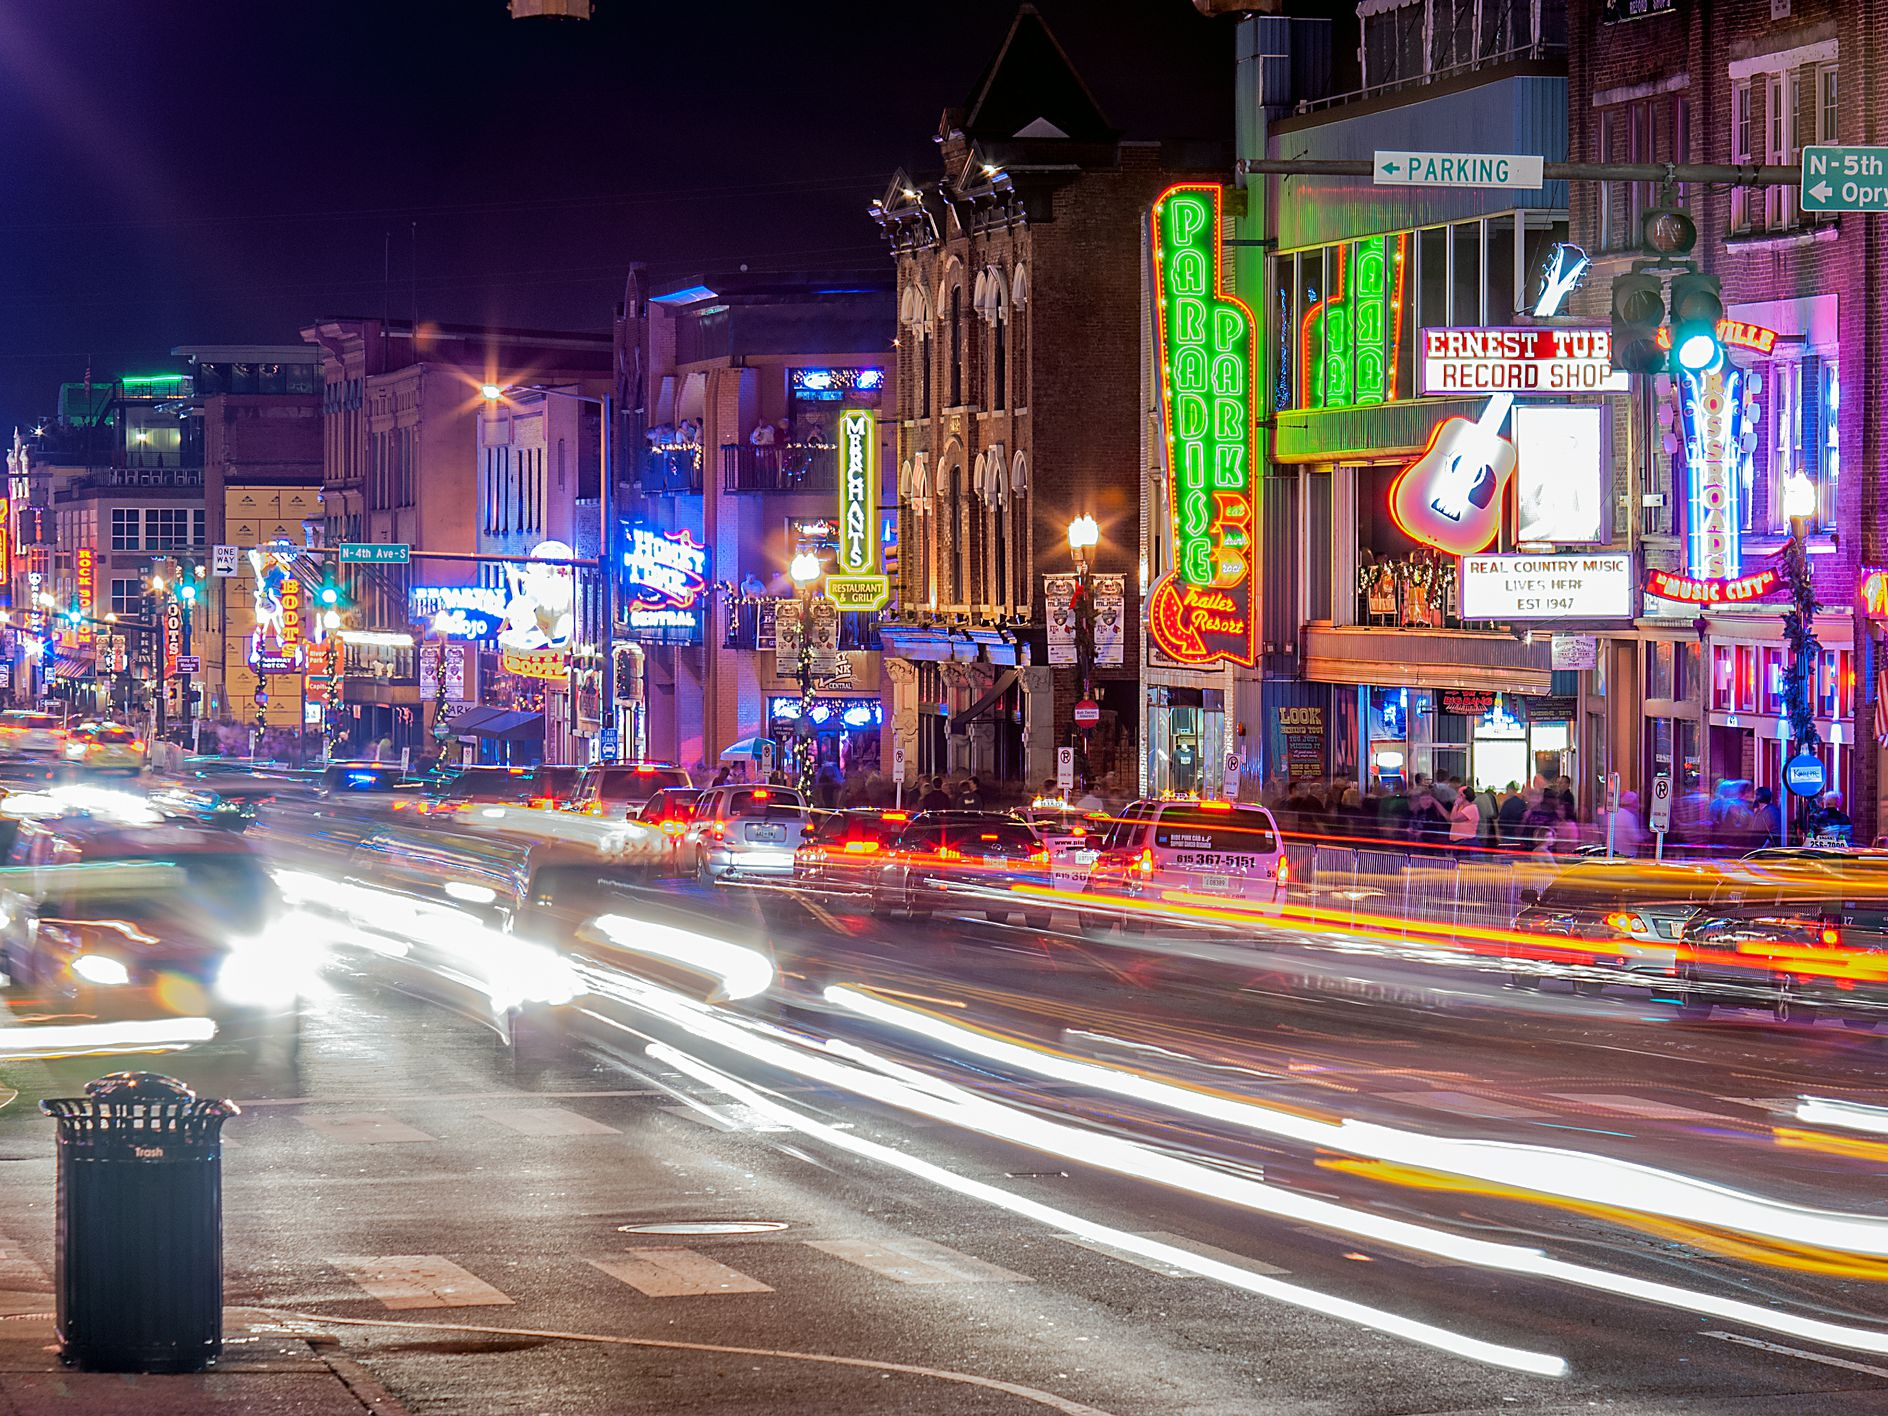 Traffic in Nashville, Tennessee